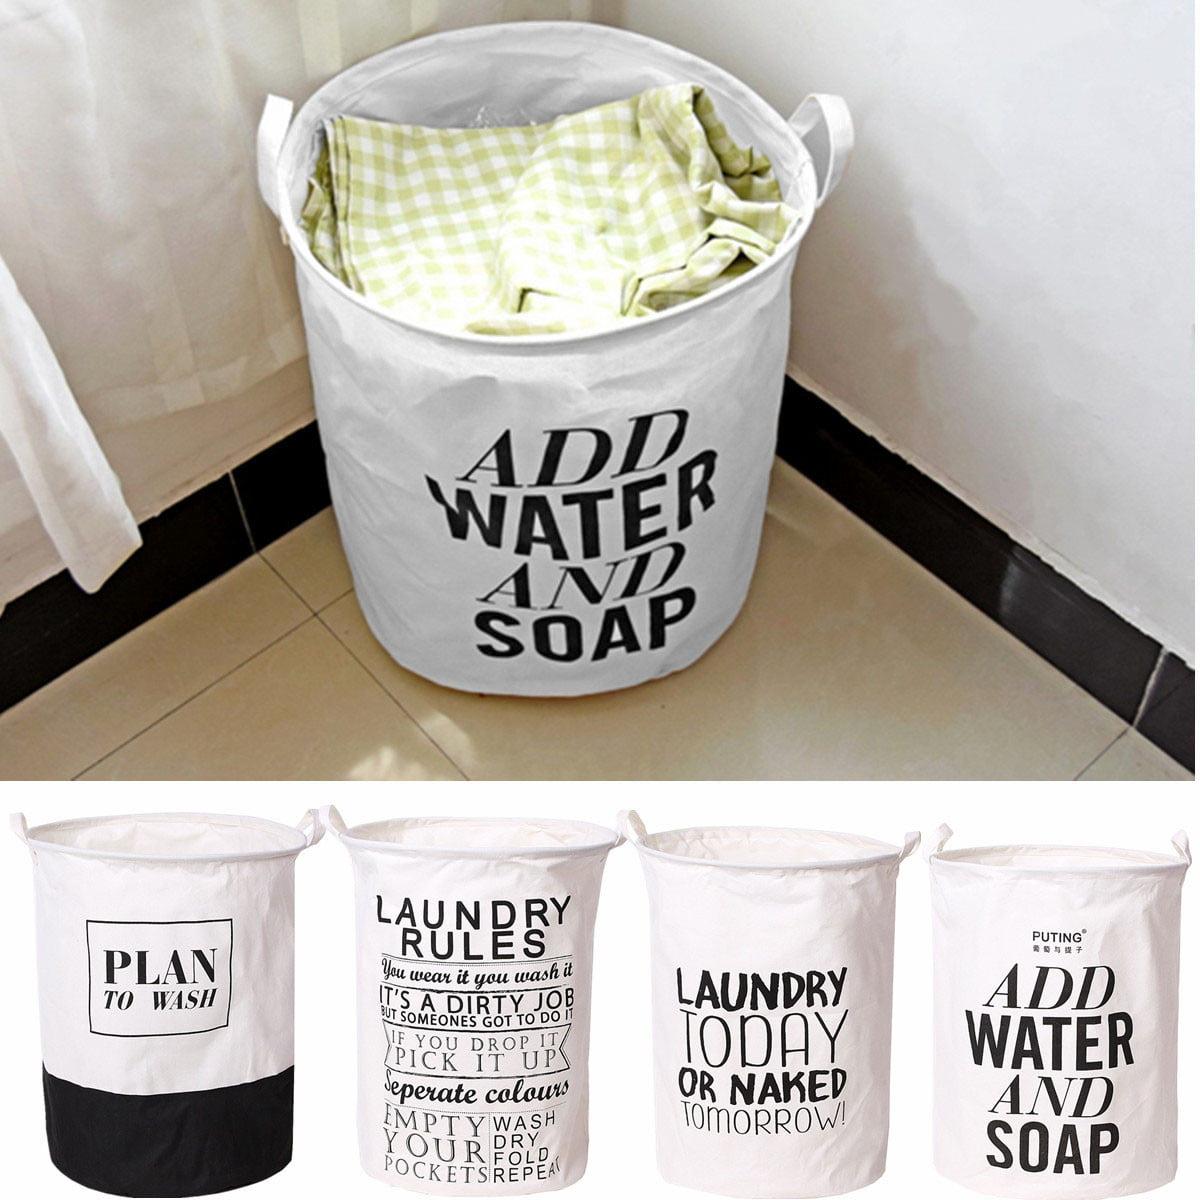 Waterproof Folding Laundry Basket Laundry Bag Foldable Linen Washing Clothes Laundry Basket Pop Up Hamper Toy Sotrage Hand Bag